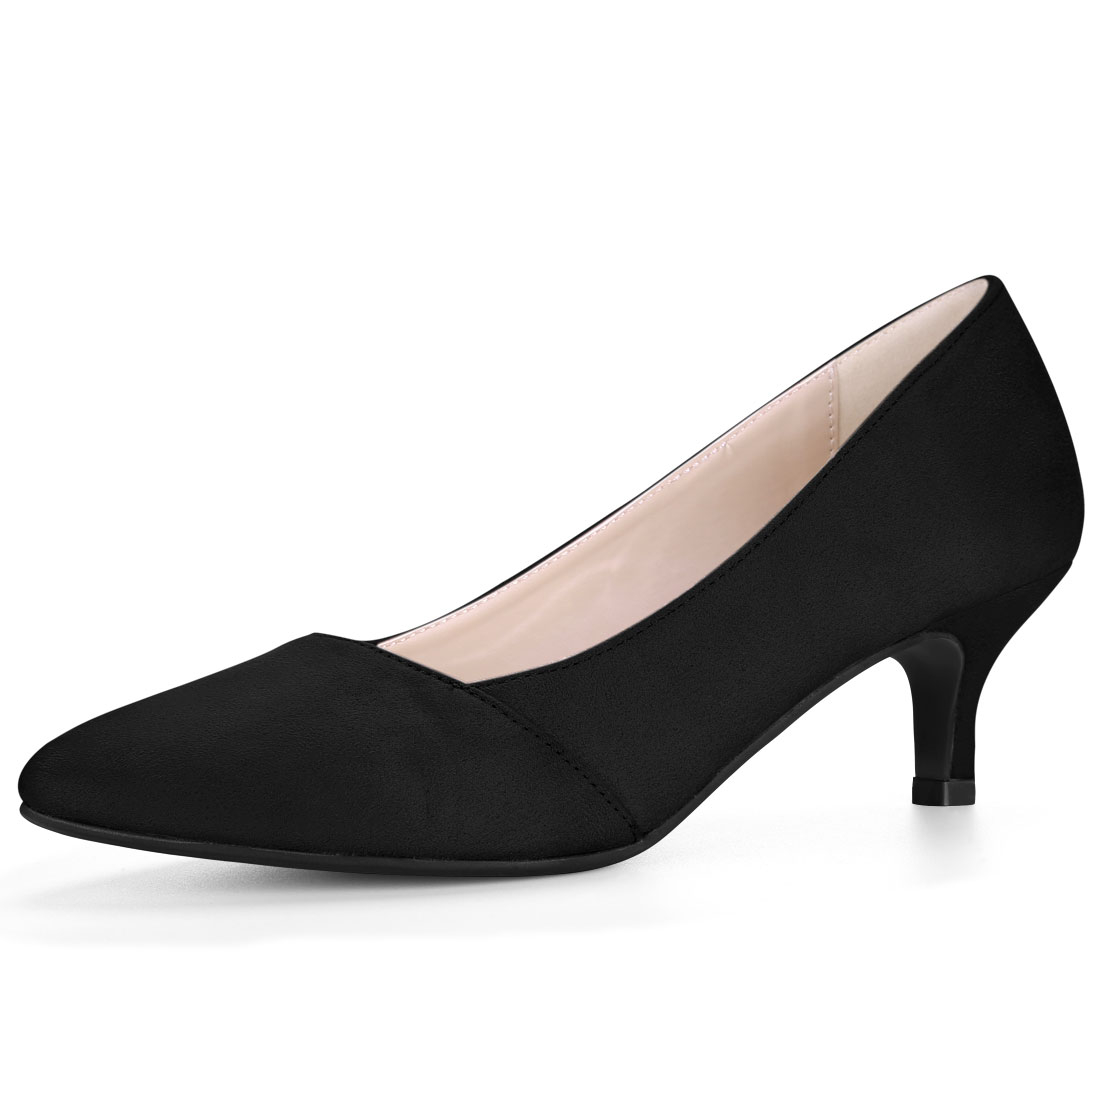 Women Pointed Toe Mid Stiletto Heel Pumps Black US 8.5